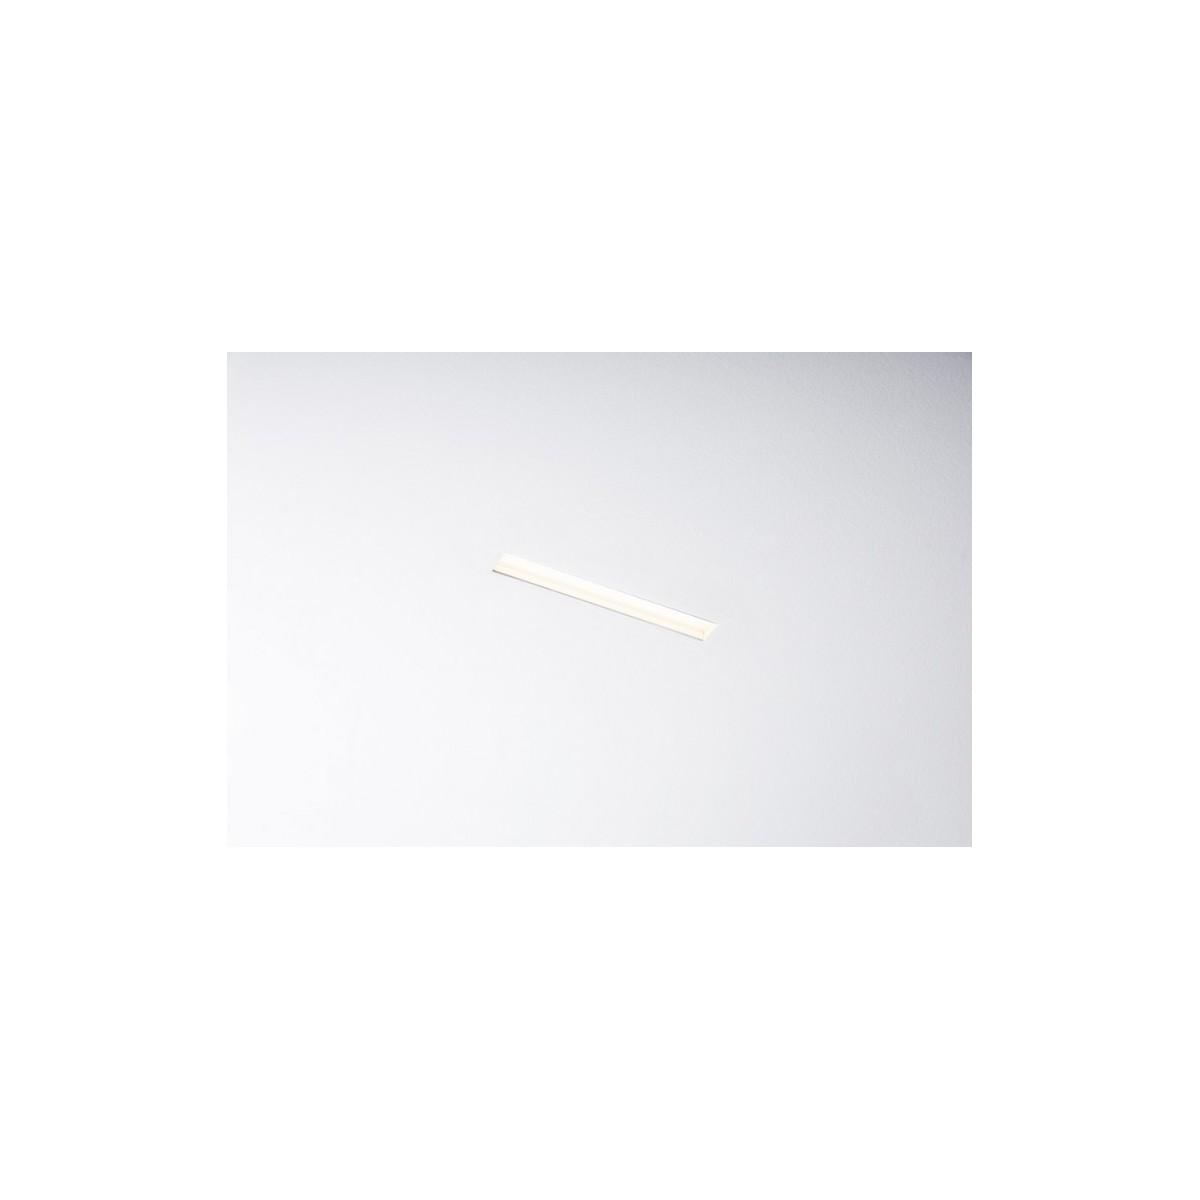 Labra RAY WP.994mm 41W High Power 6-0638 Wpust